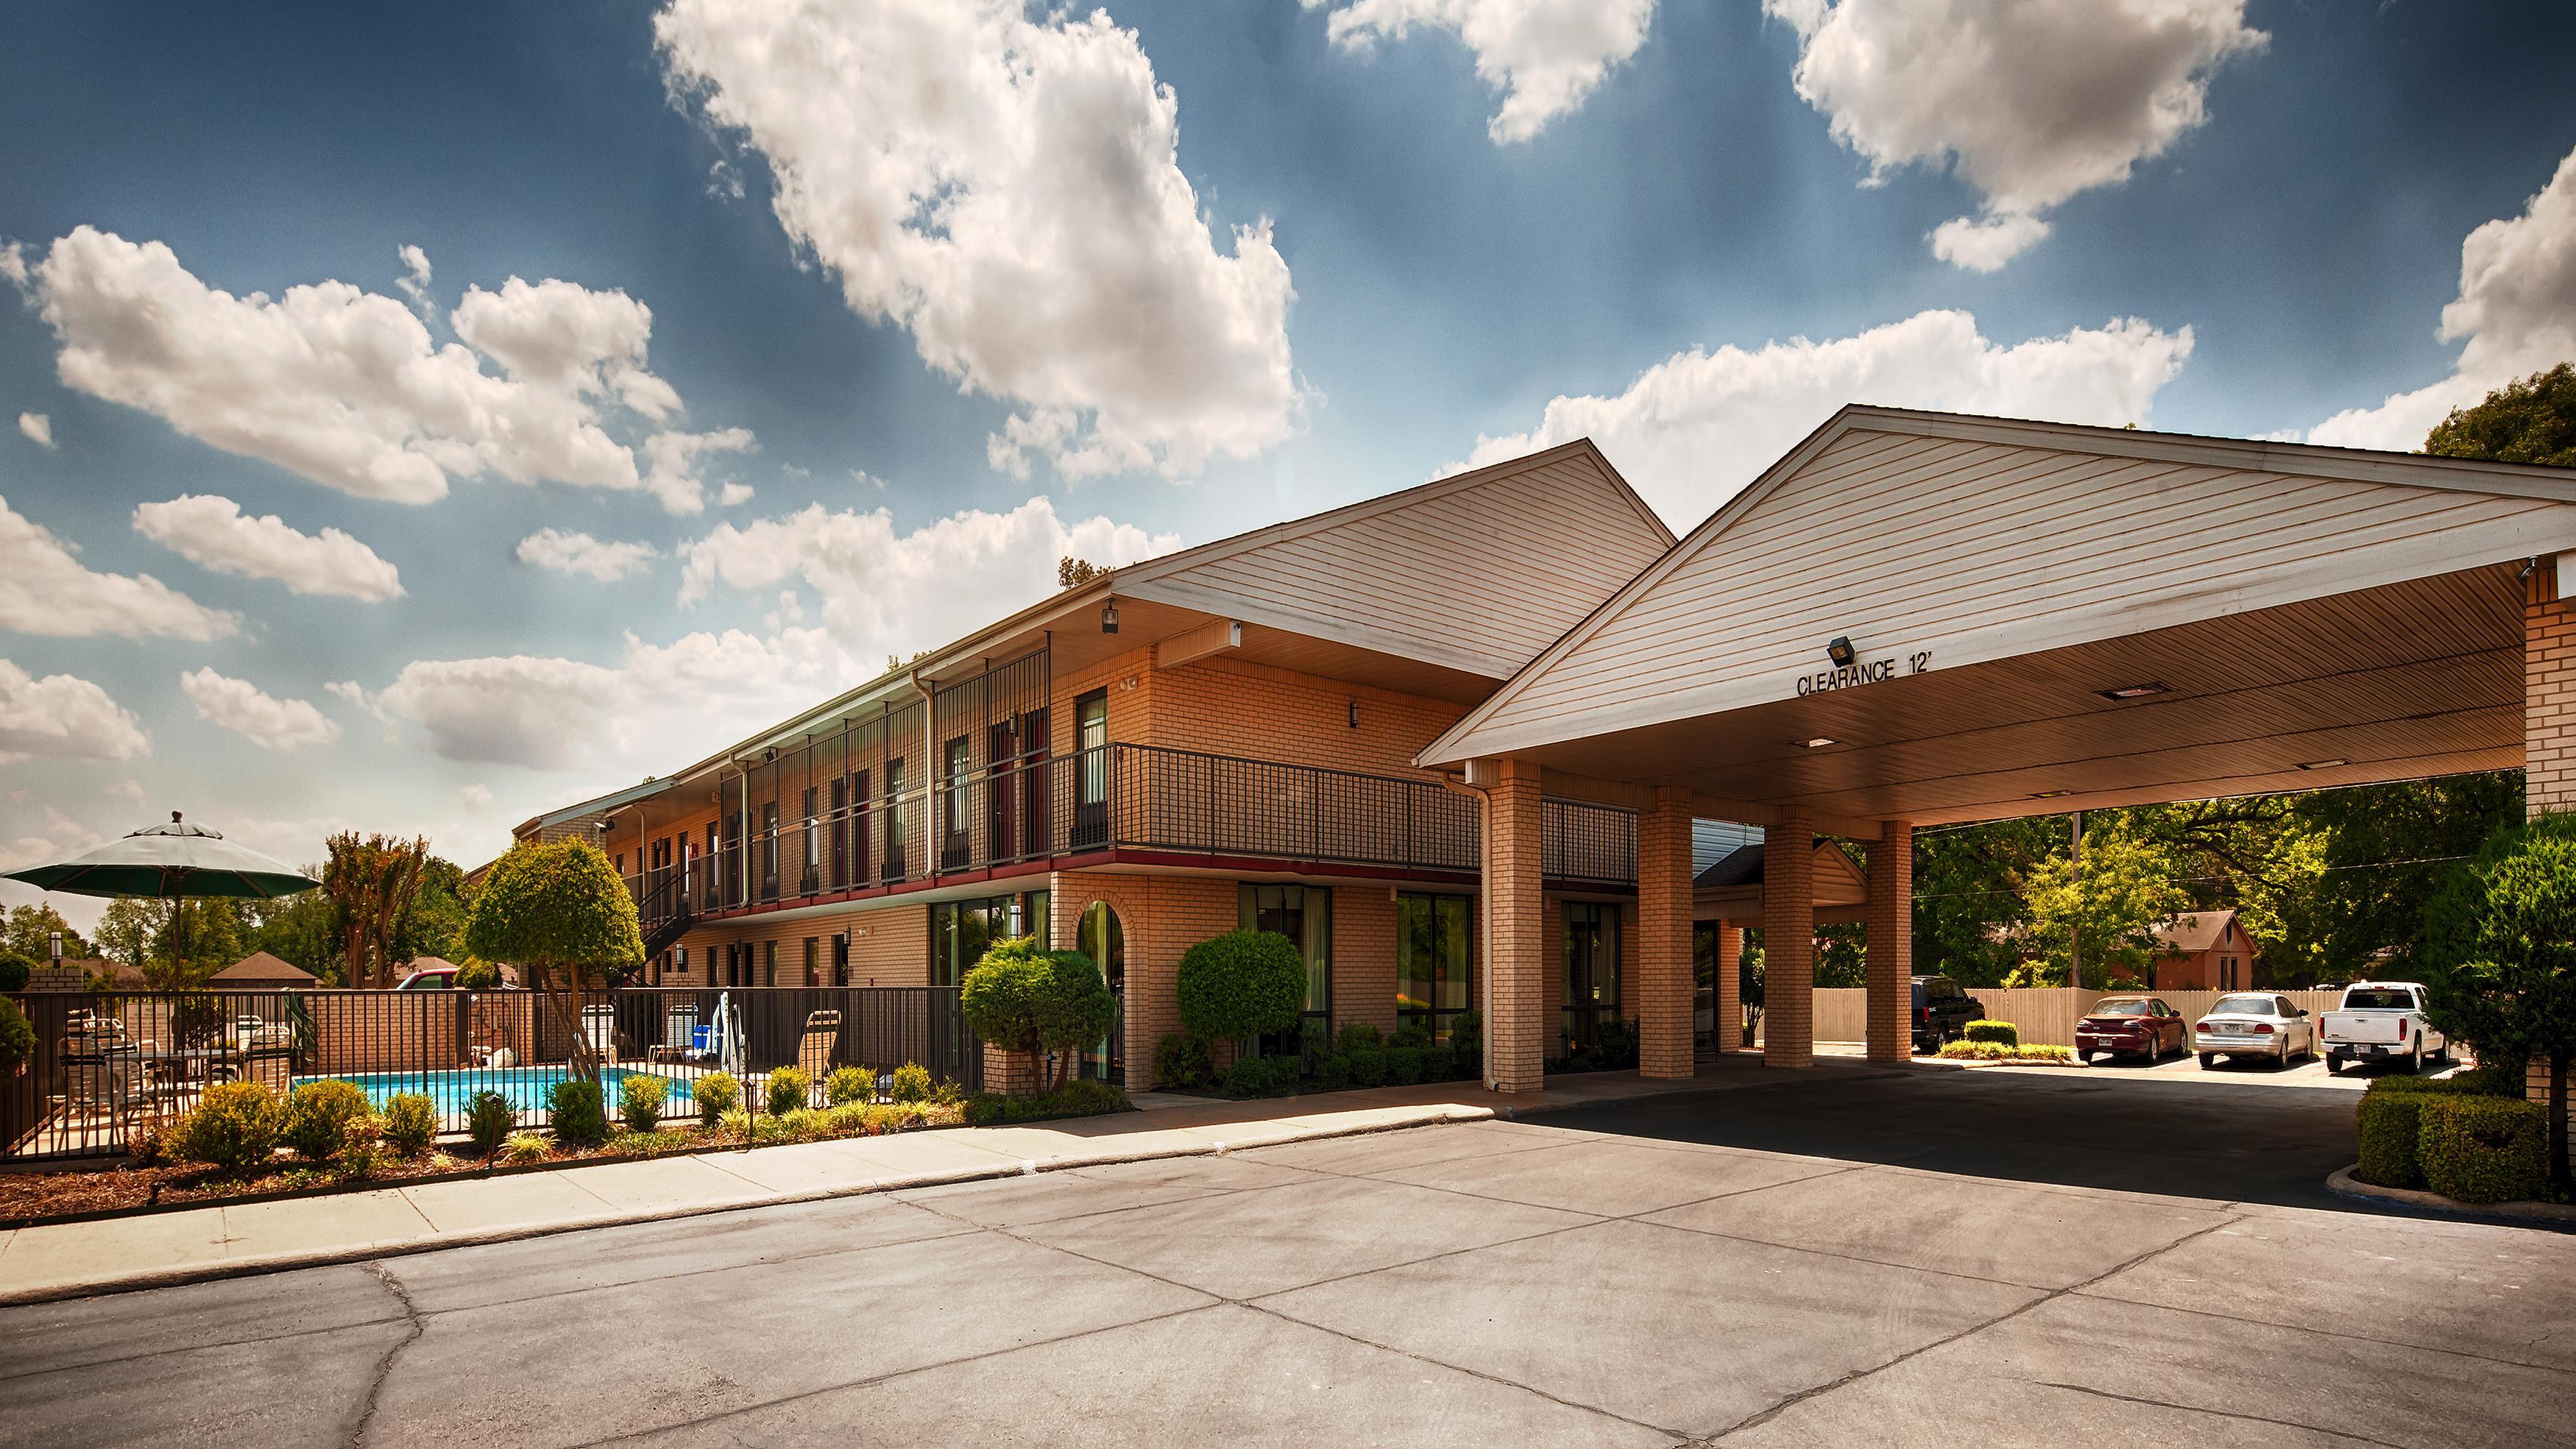 Best Western Inn, West Helena AR